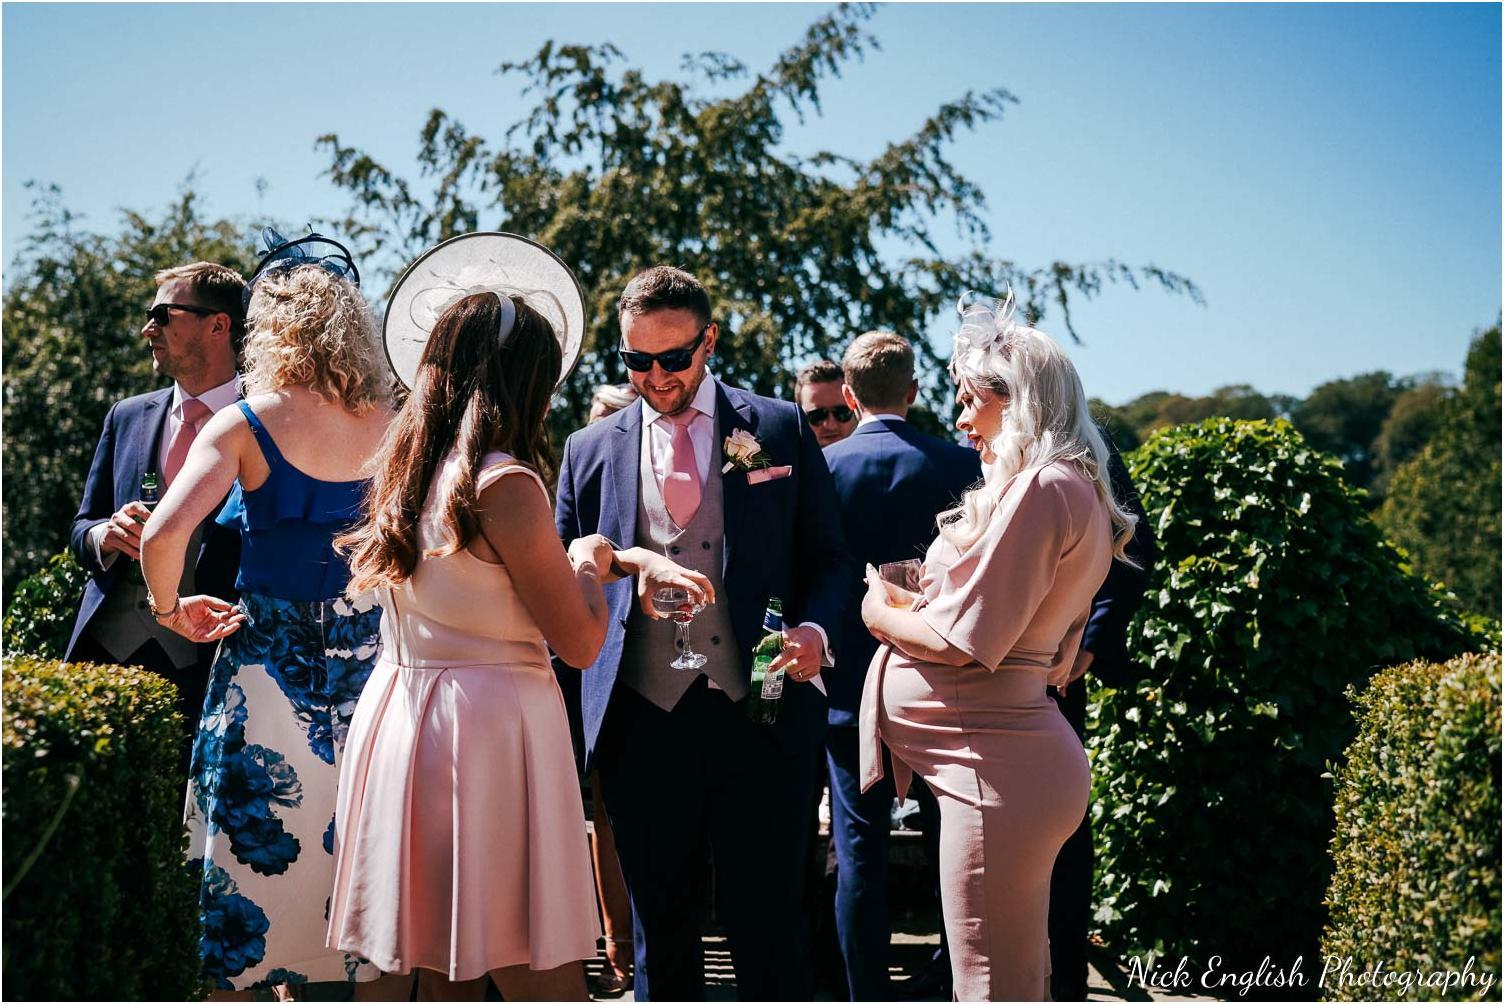 Mitton_Hall_Wedding_Photograph-89.jpg